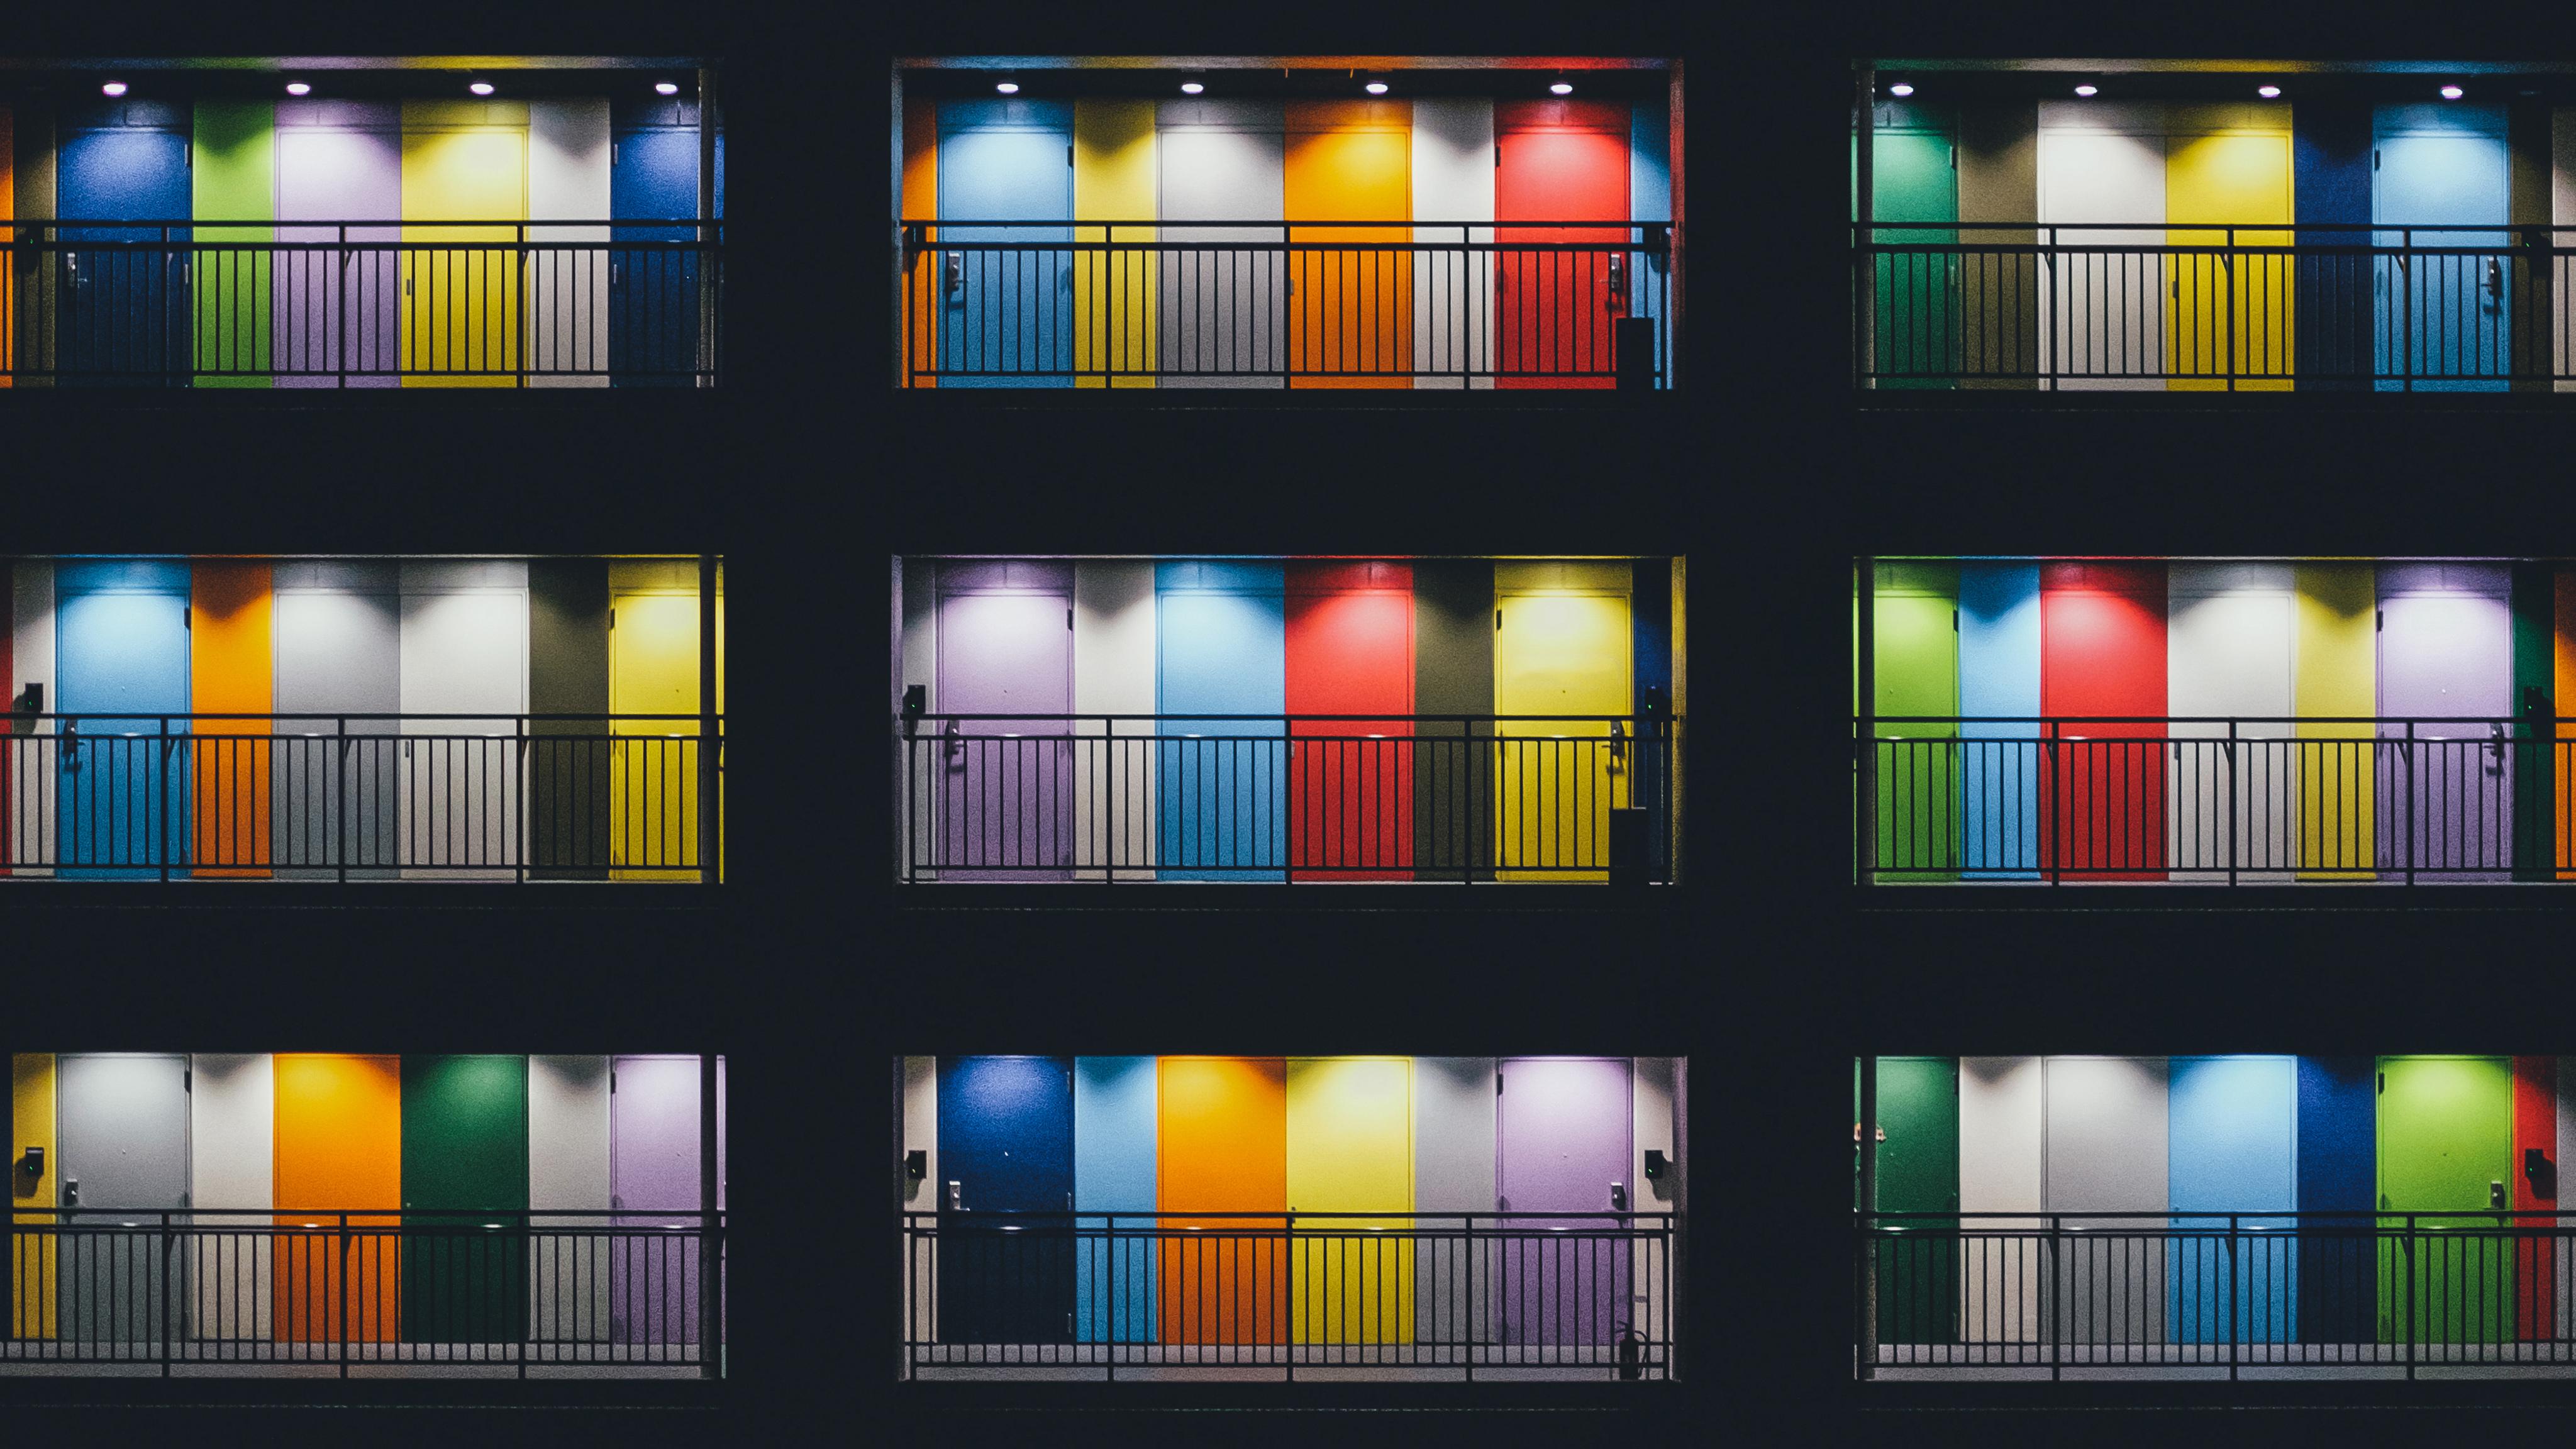 colorful balcon symmetry 1574938517 - Colorful Balcon Symmetry -